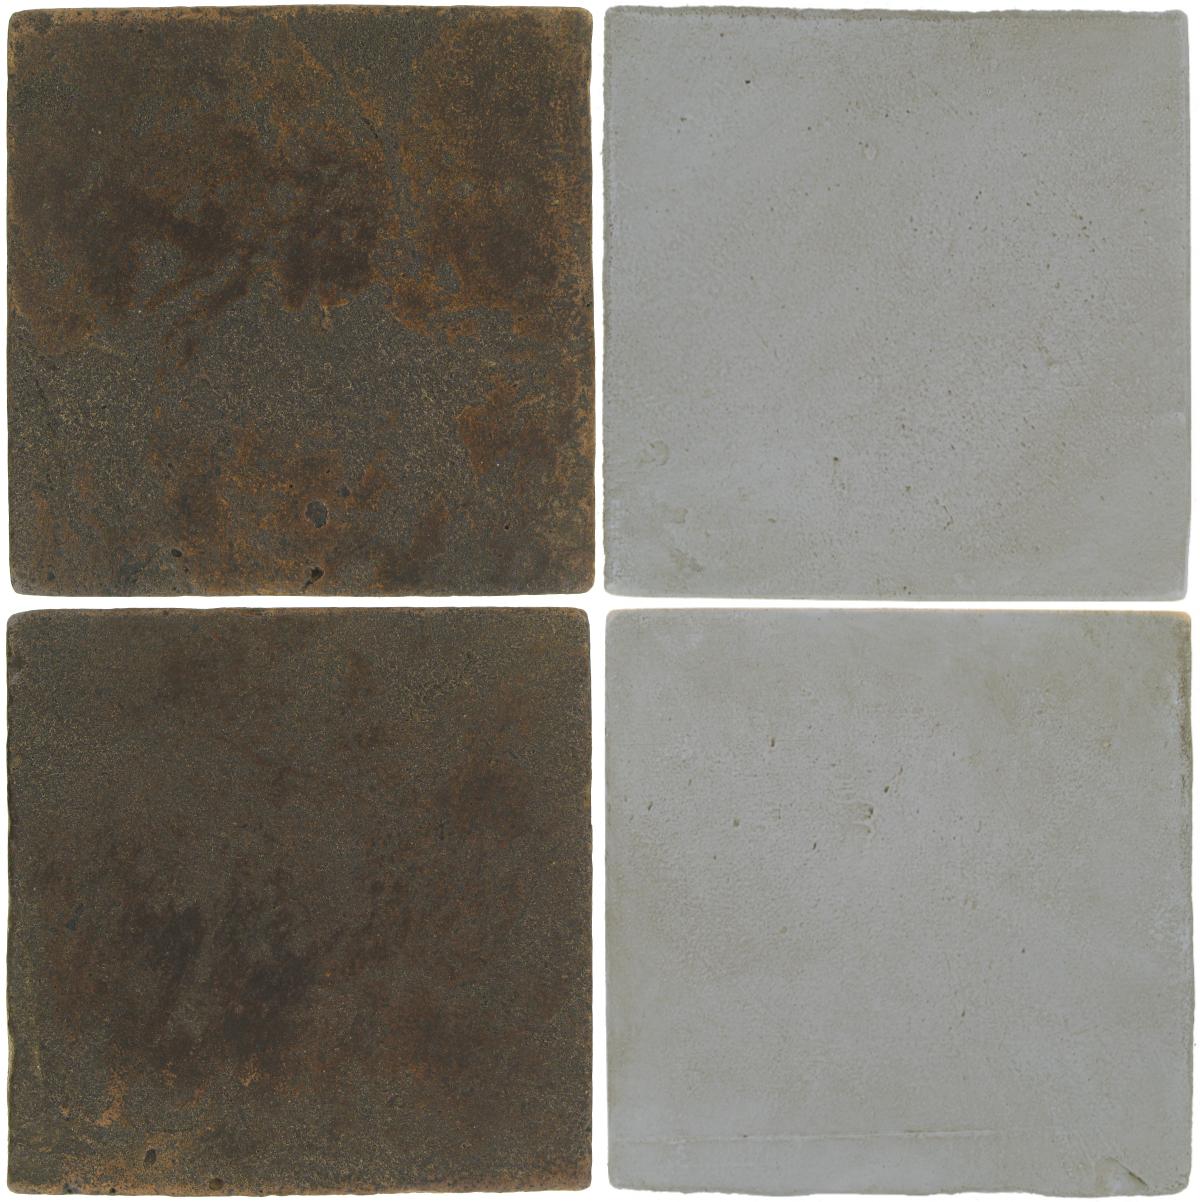 Pedralbes Antique Terracotta  2 Color Combinations  VTG-PSCO Cologne Brown + OHS-PGOG Oyster Grey